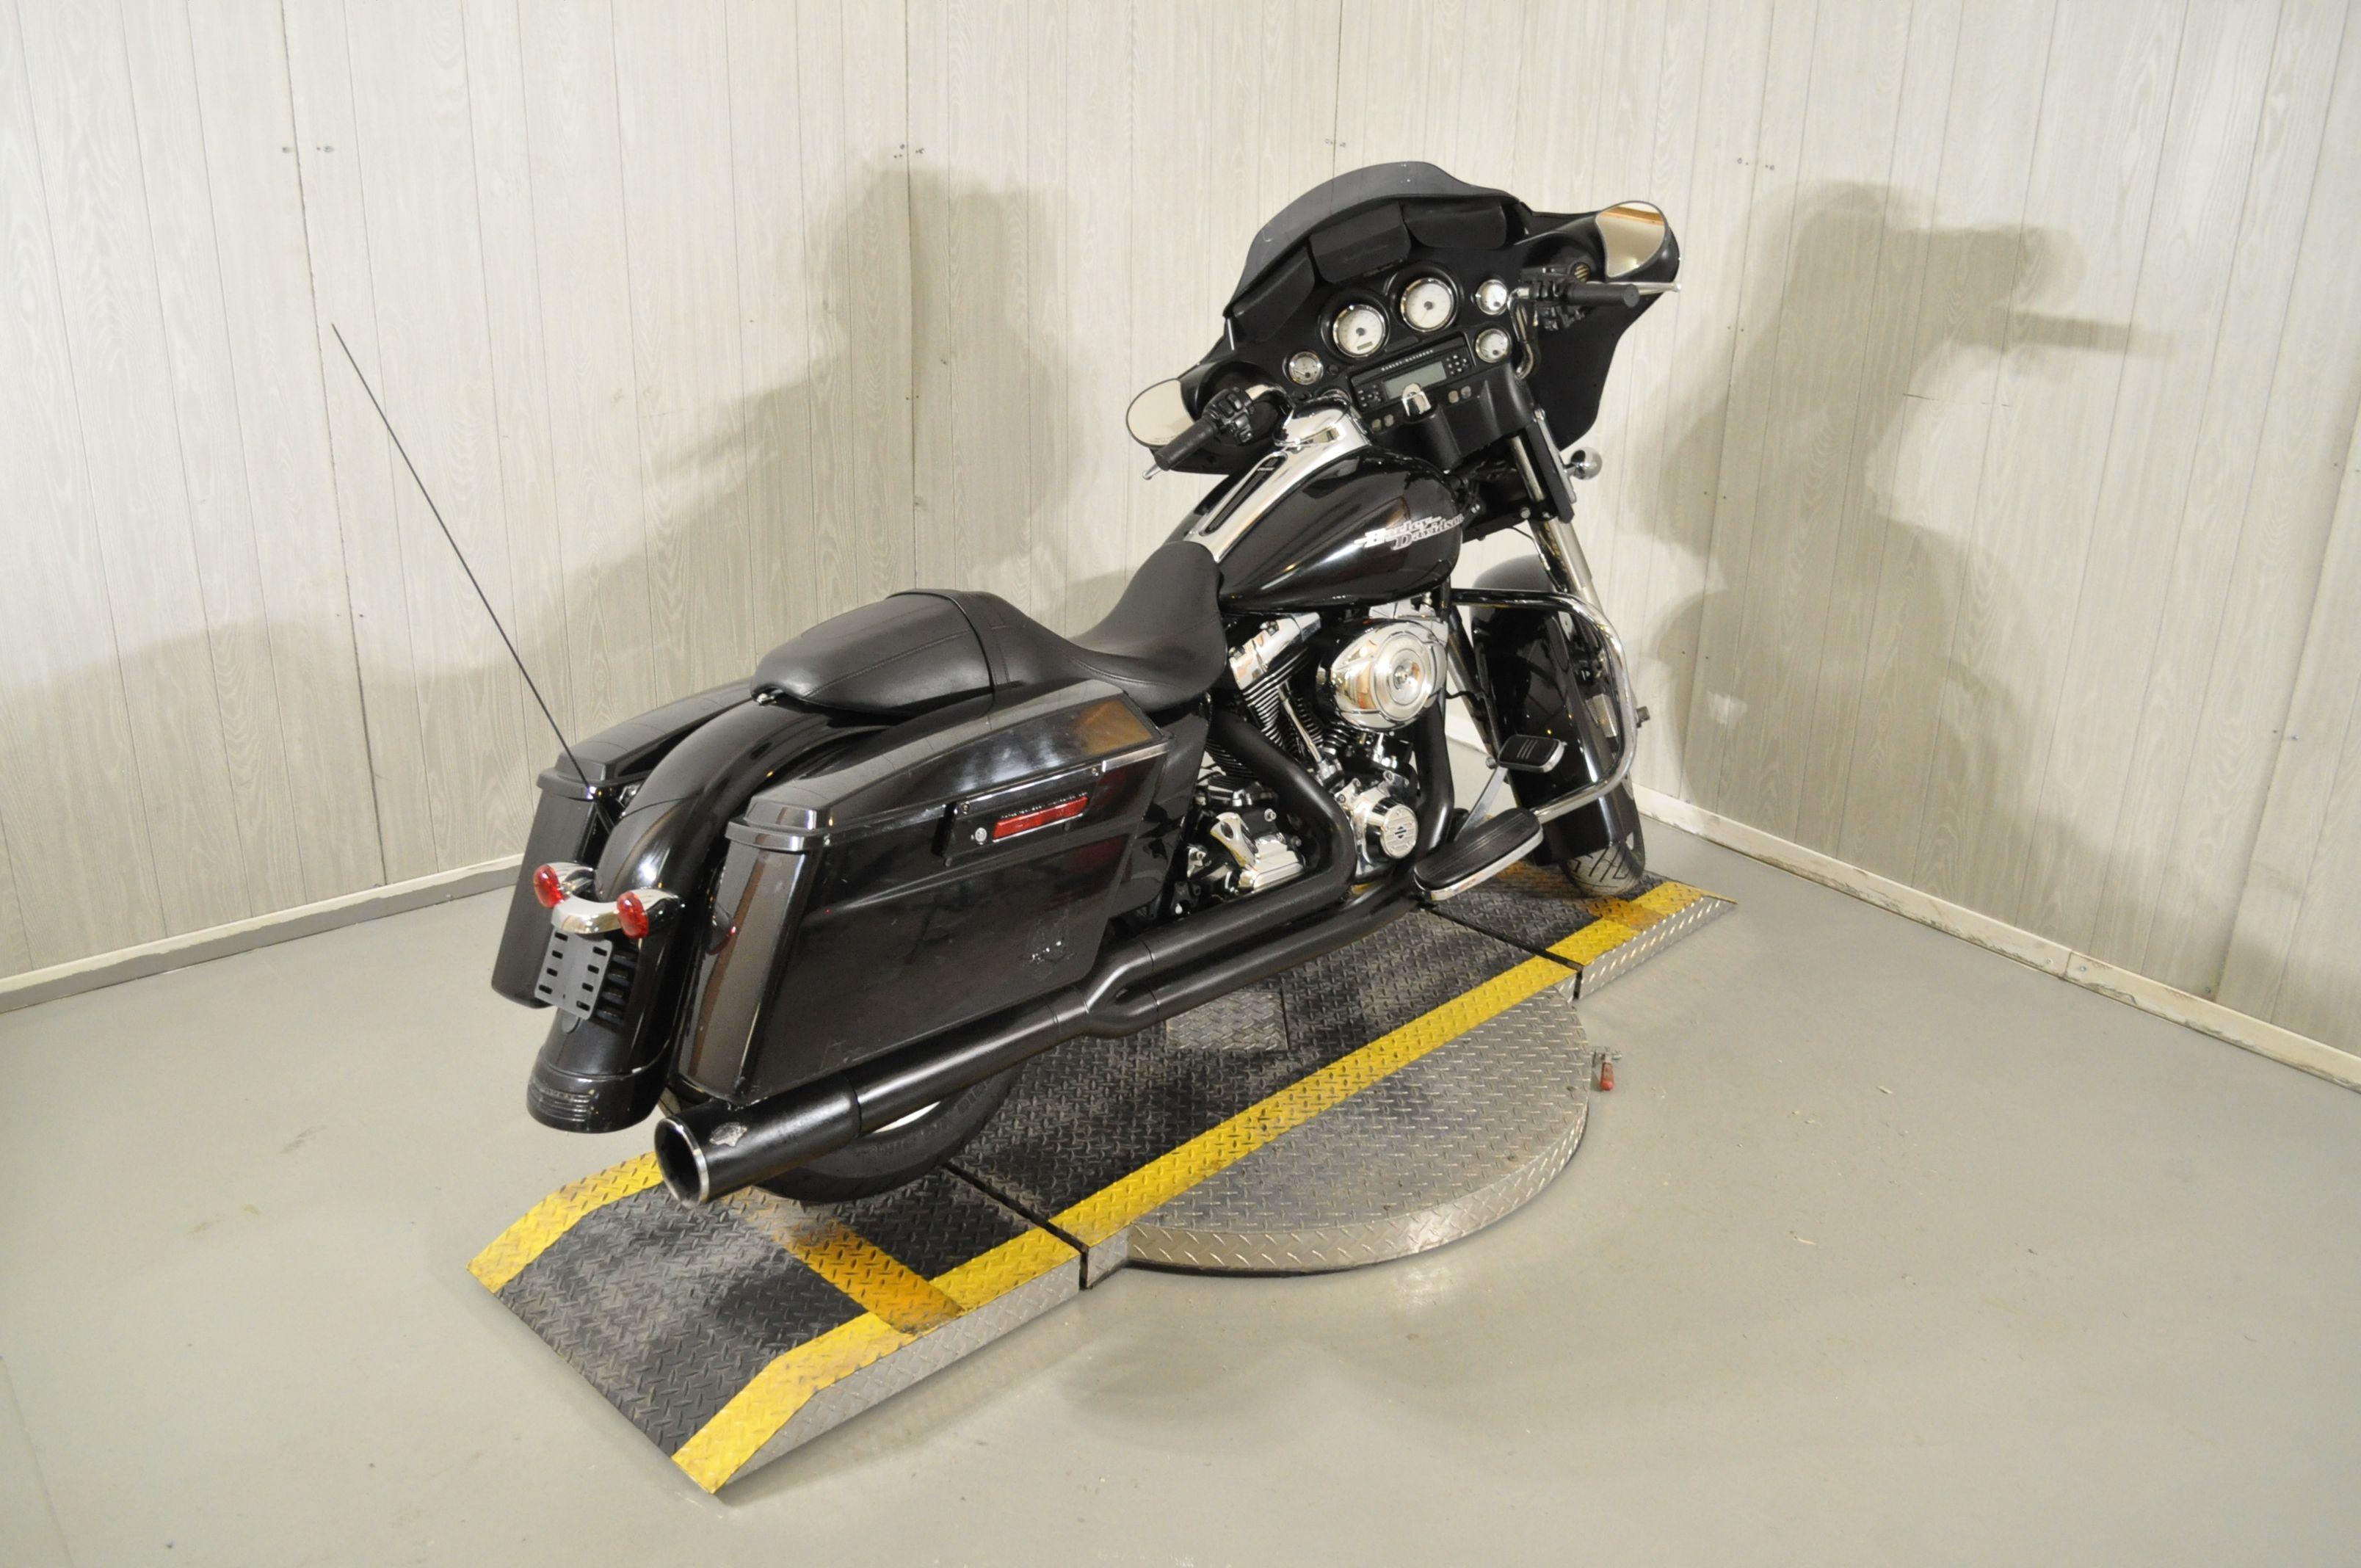 Pre-Owned 2013 Harley-Davidson Street Glide FLHX